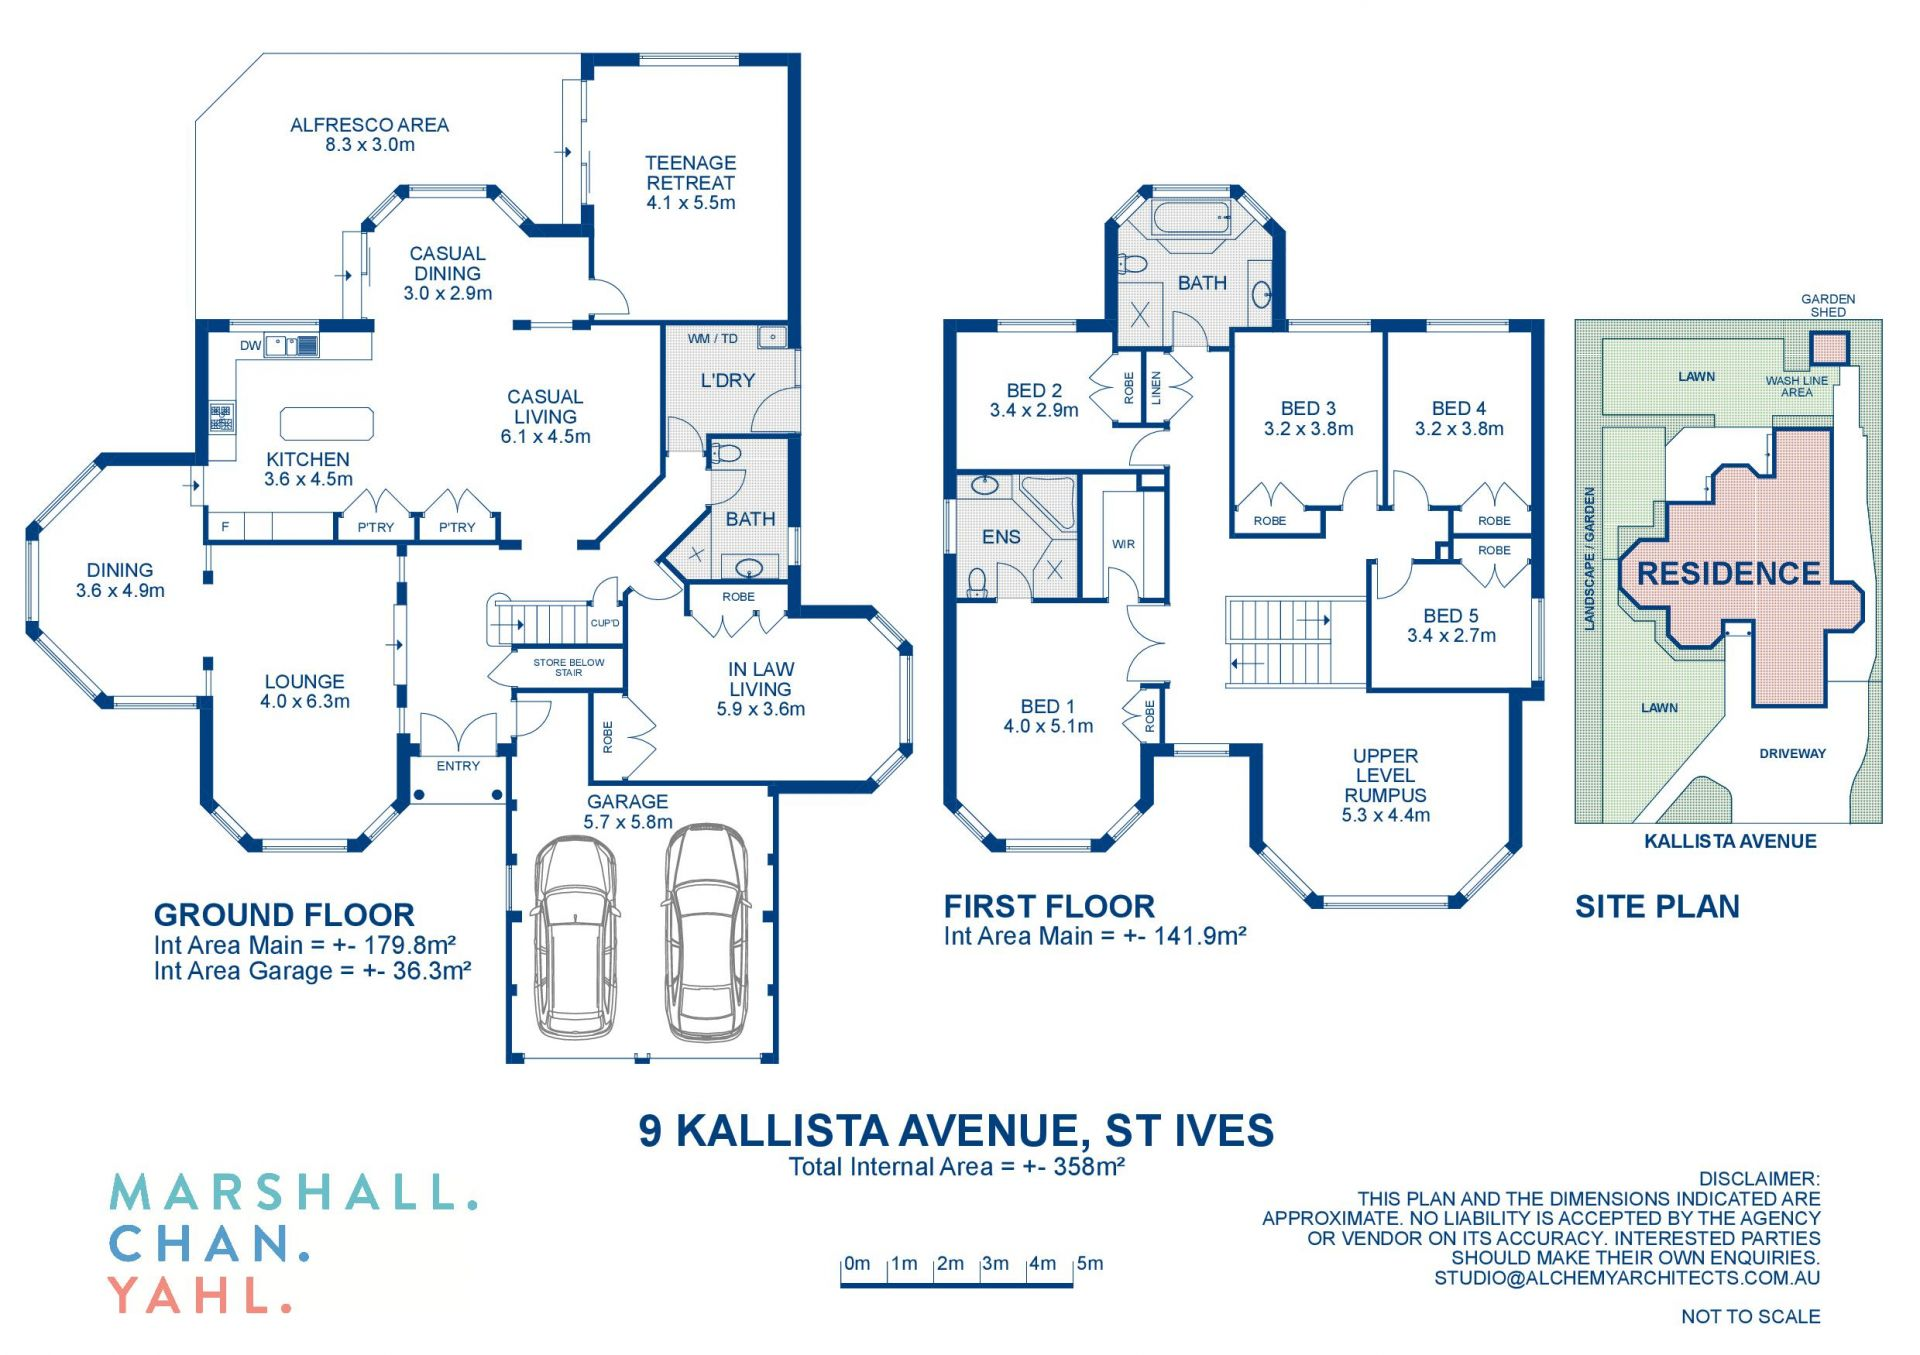 9 Kallista Avenue St Ives 2075